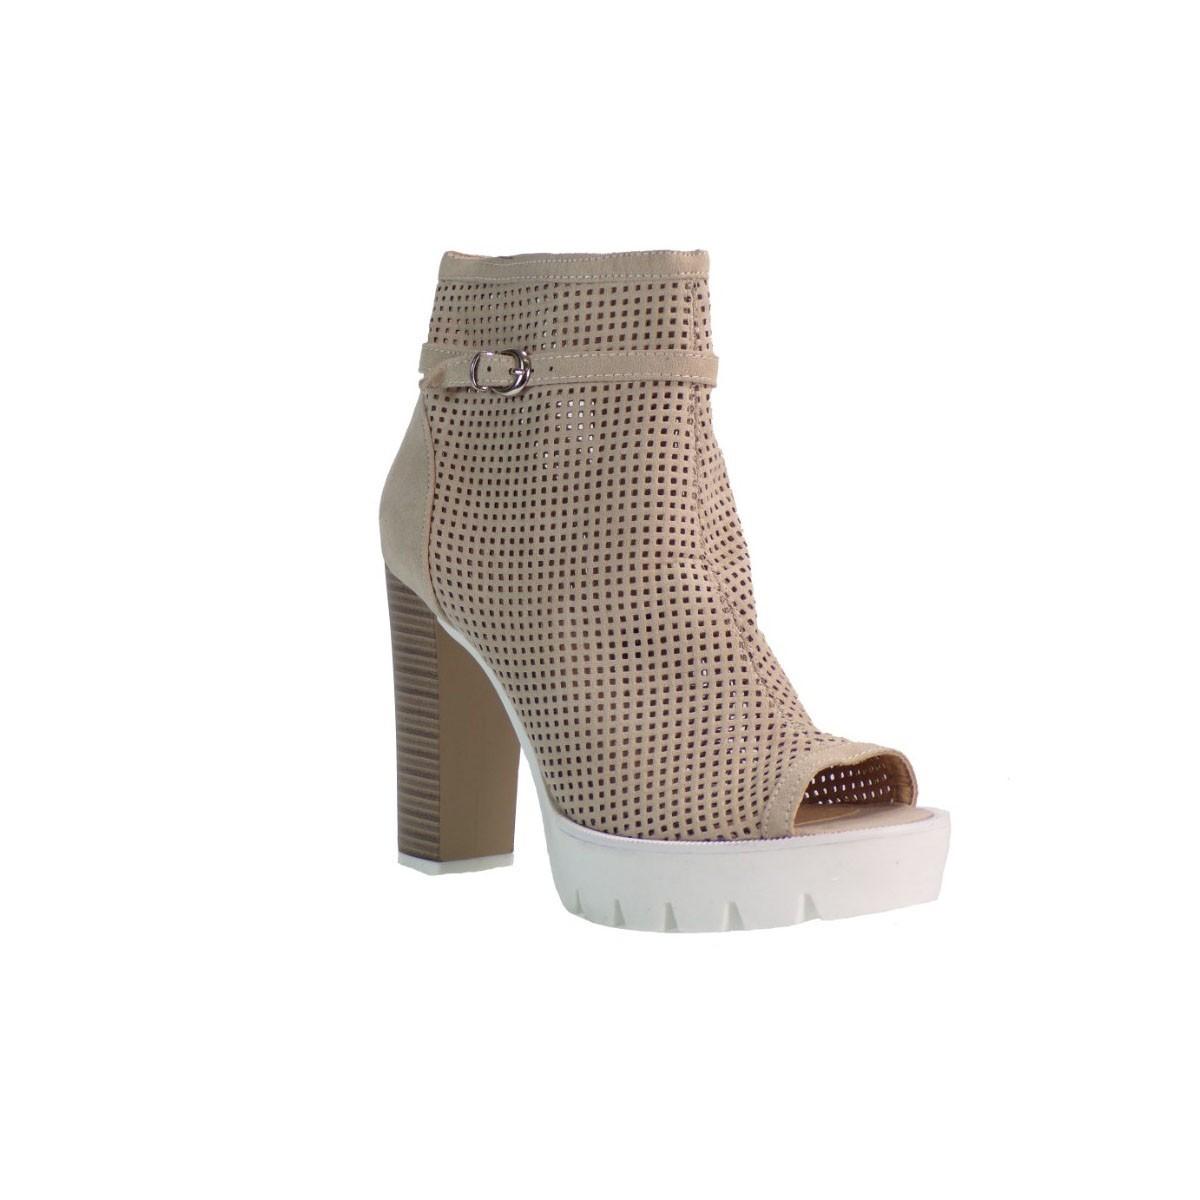 Fashion Icon Γυναικεία Παπούτσια Μποτάκια F16-05076 Μπεζ Καστόρι Fashion icon f16-05076 Mπεζ